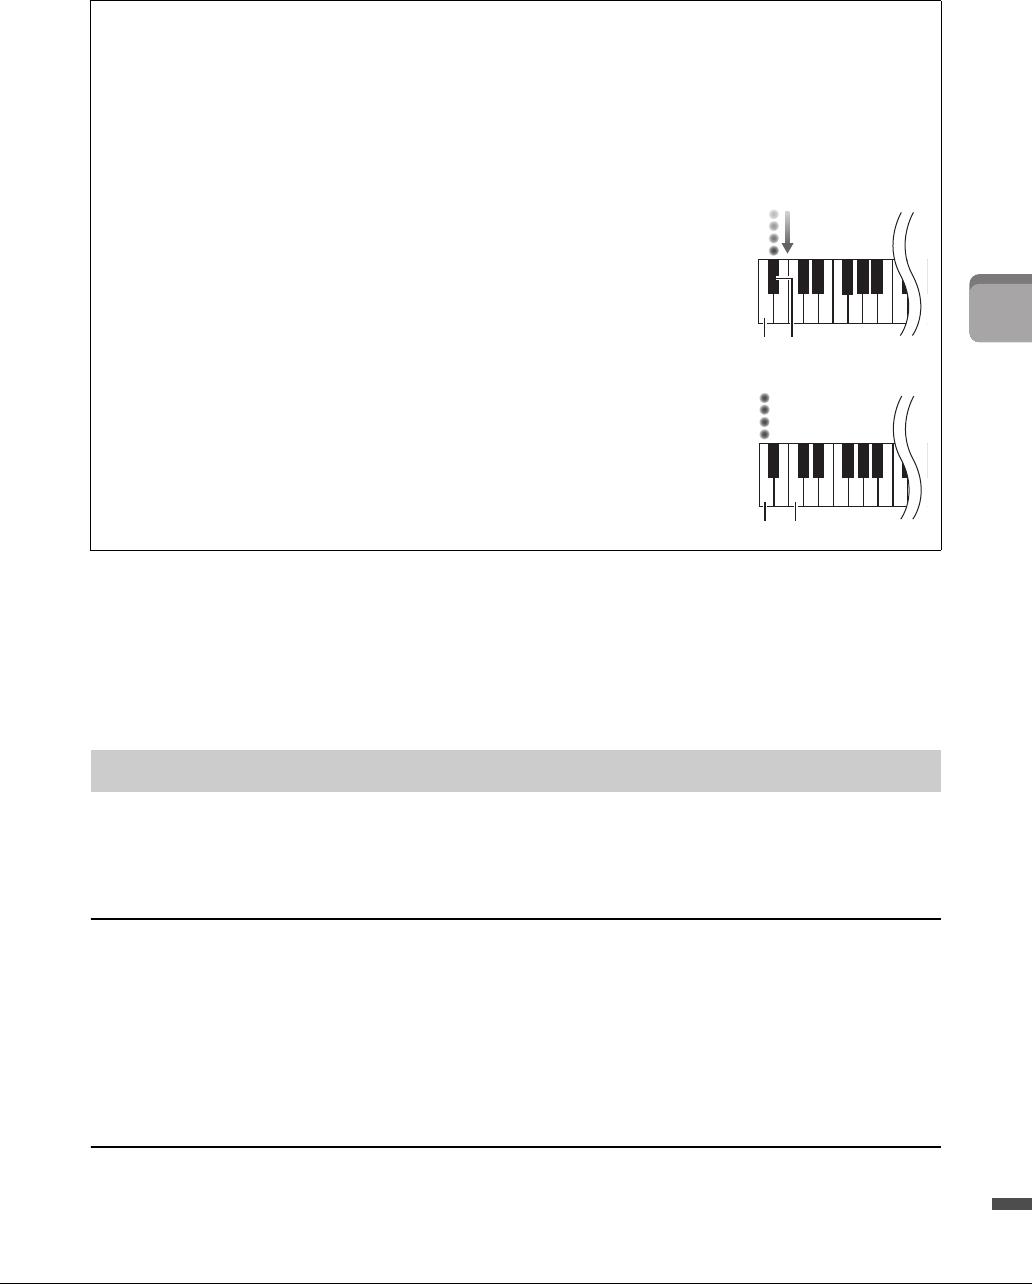 Yamaha Csp 170 150 Owners Manual Csp170 En Om B0 4x12 Speaker Cabinet Wiring Stereo Mono Google Groups 23